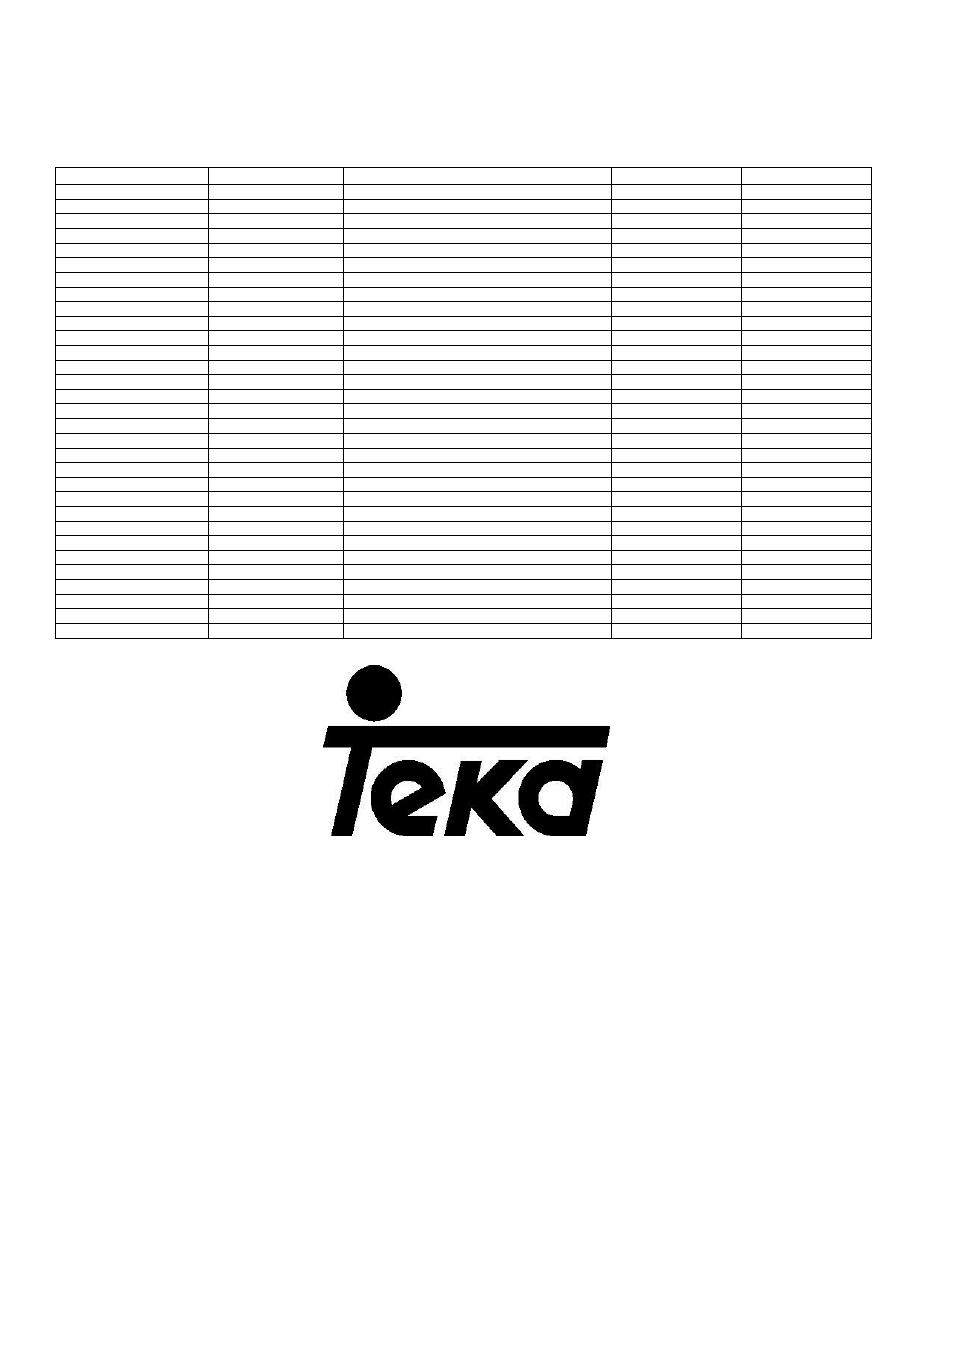 Teka group | Teka NFE2 320 X User Manual | Page 100 / 100